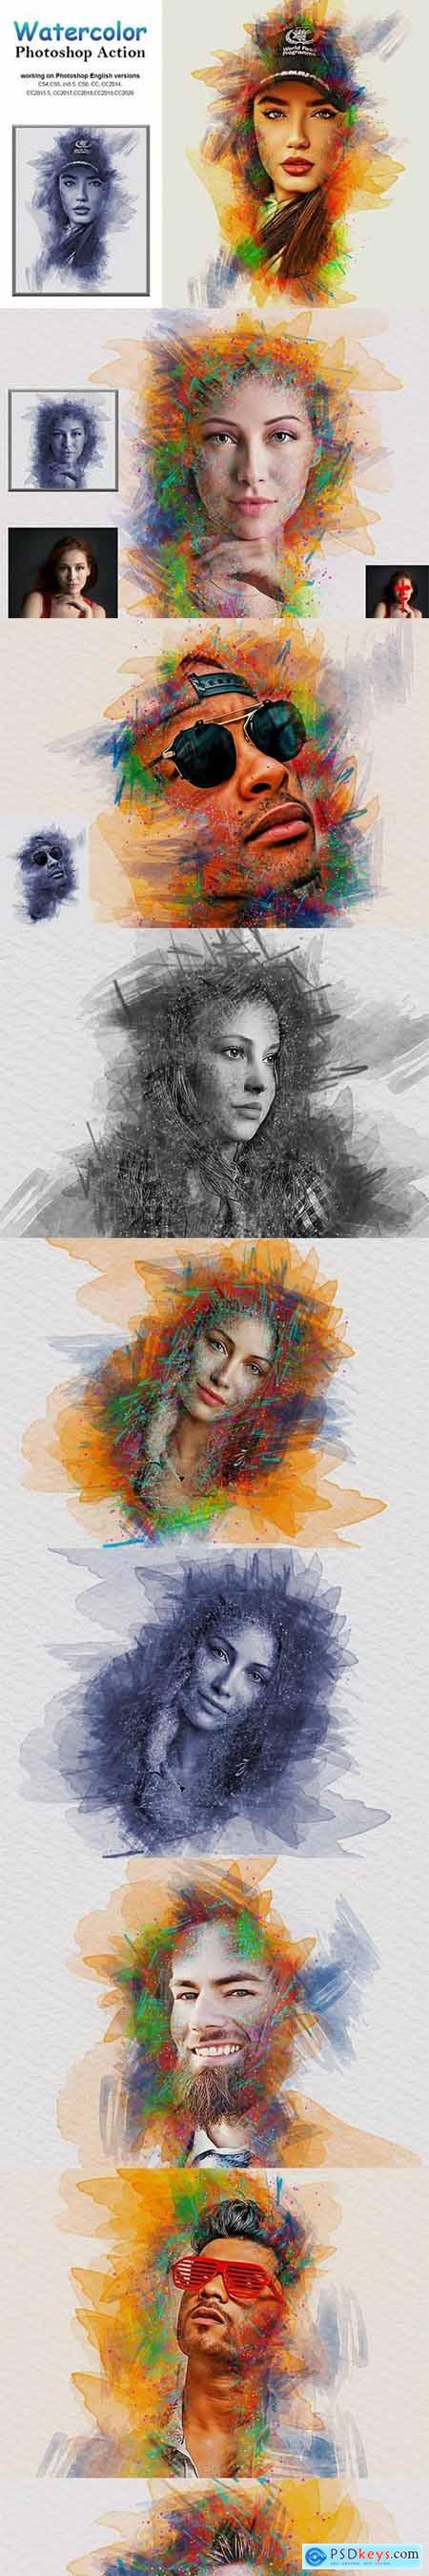 Watercolor Photoshop Action 5232780